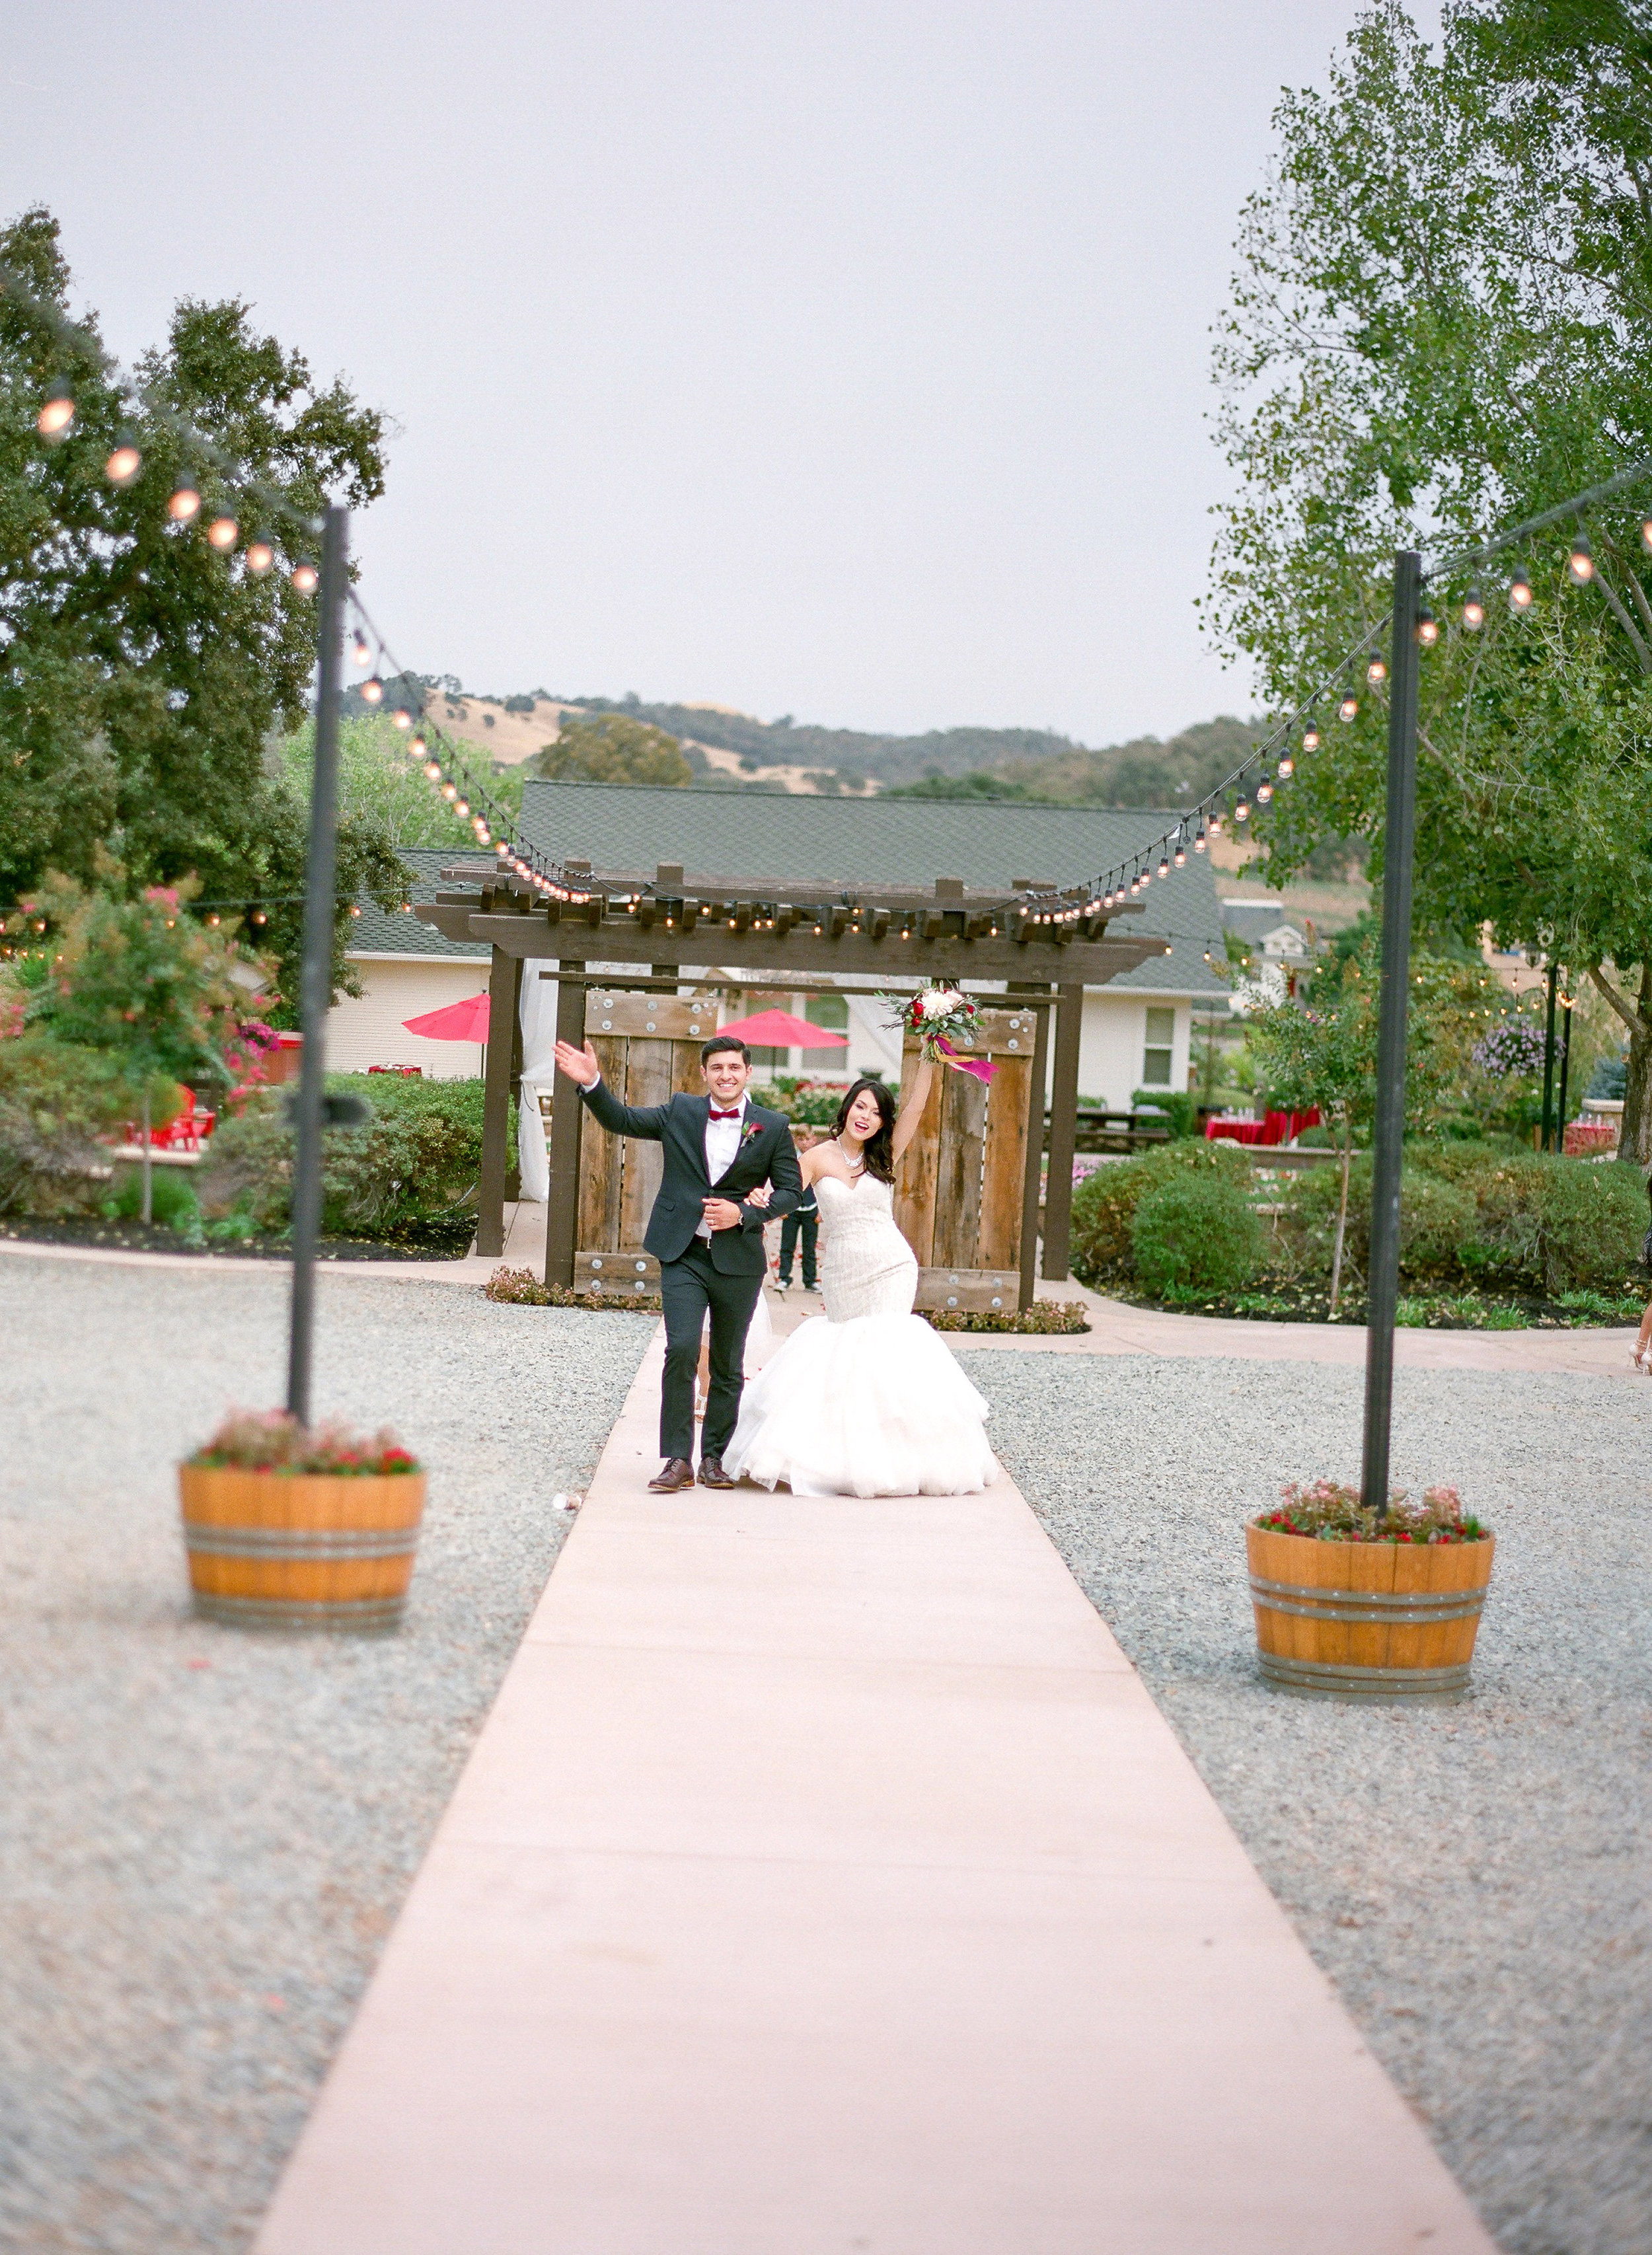 Amador_County_Wedding_Bride_Groom_Lights_Rancho_Victoria_Vineyard_Northern_California.jpg